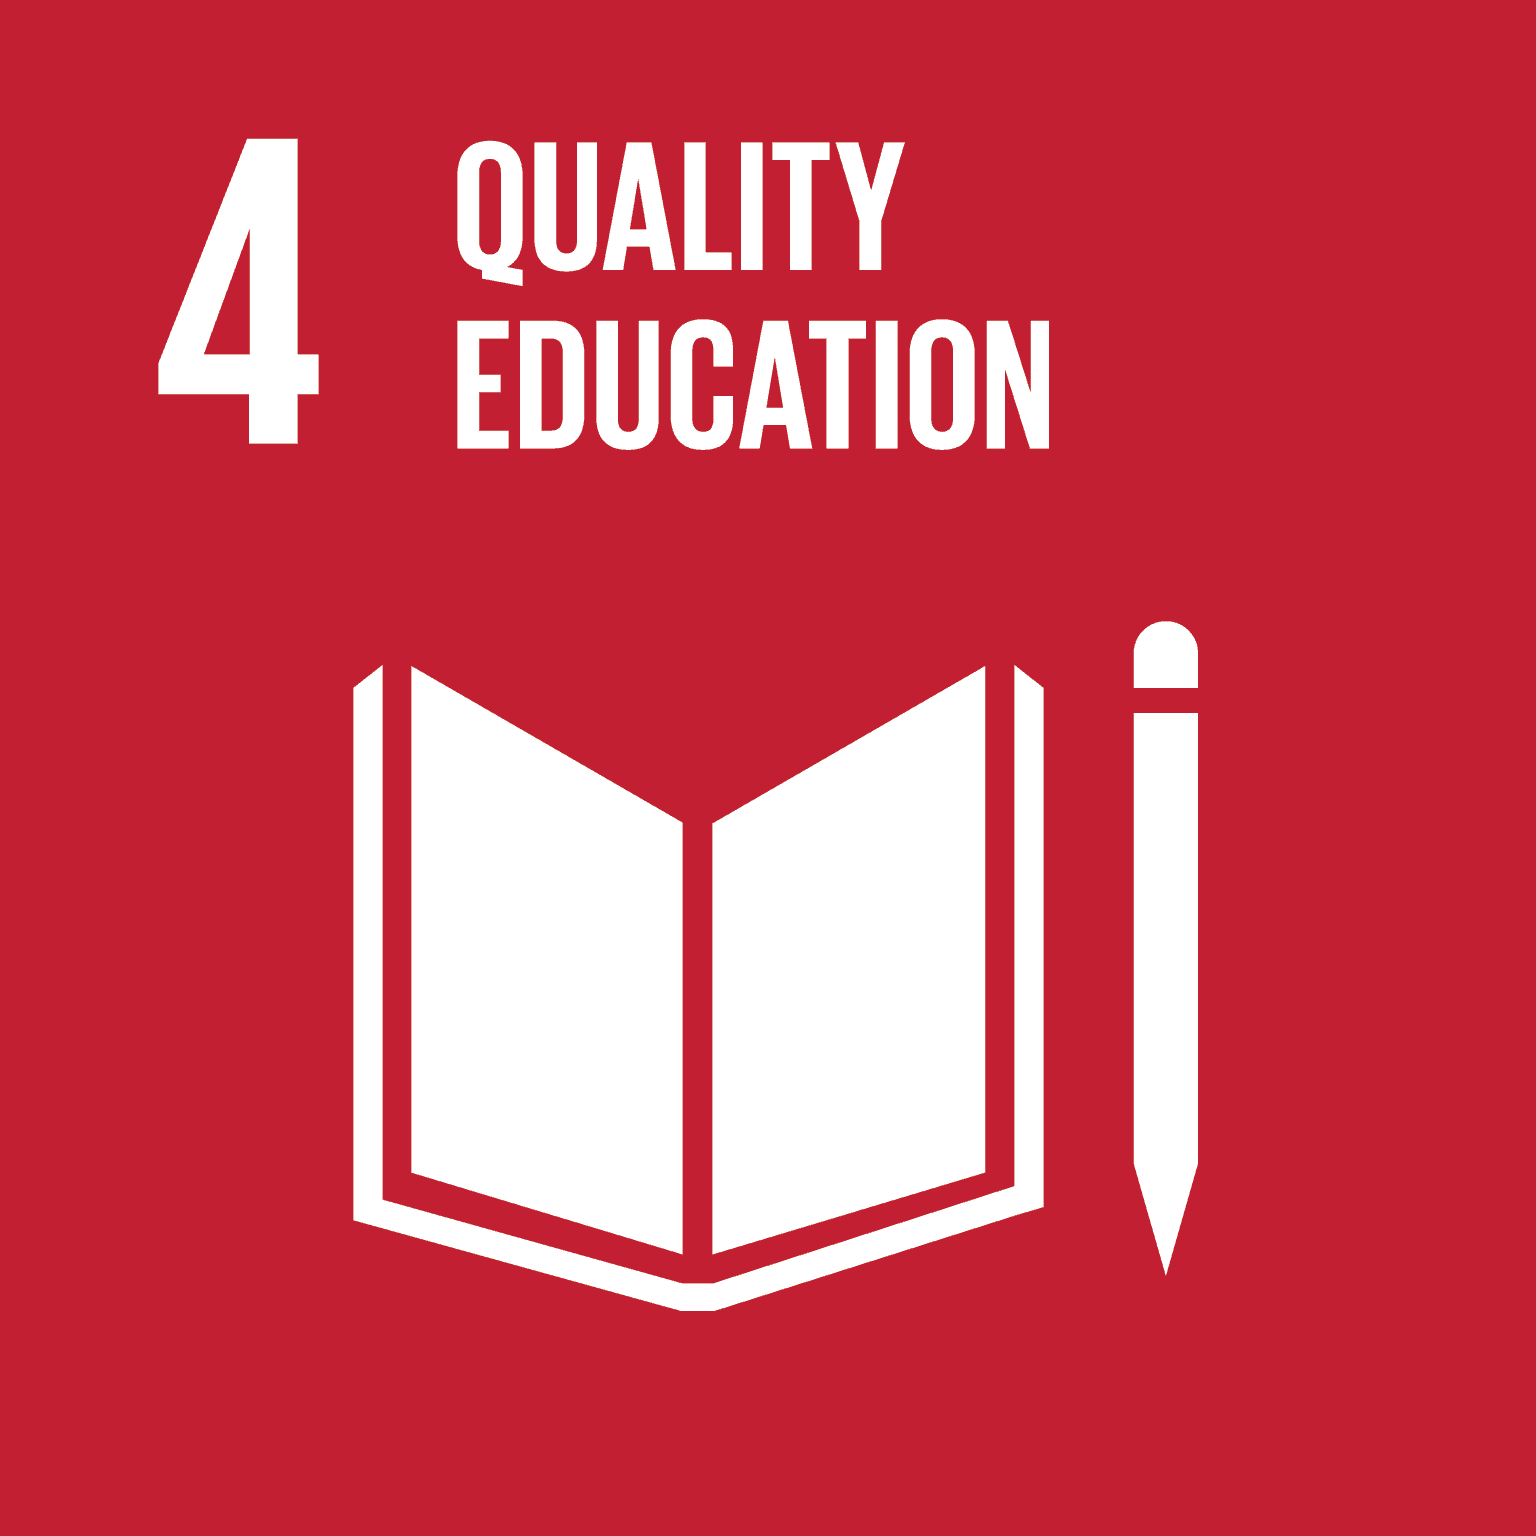 quality education icon